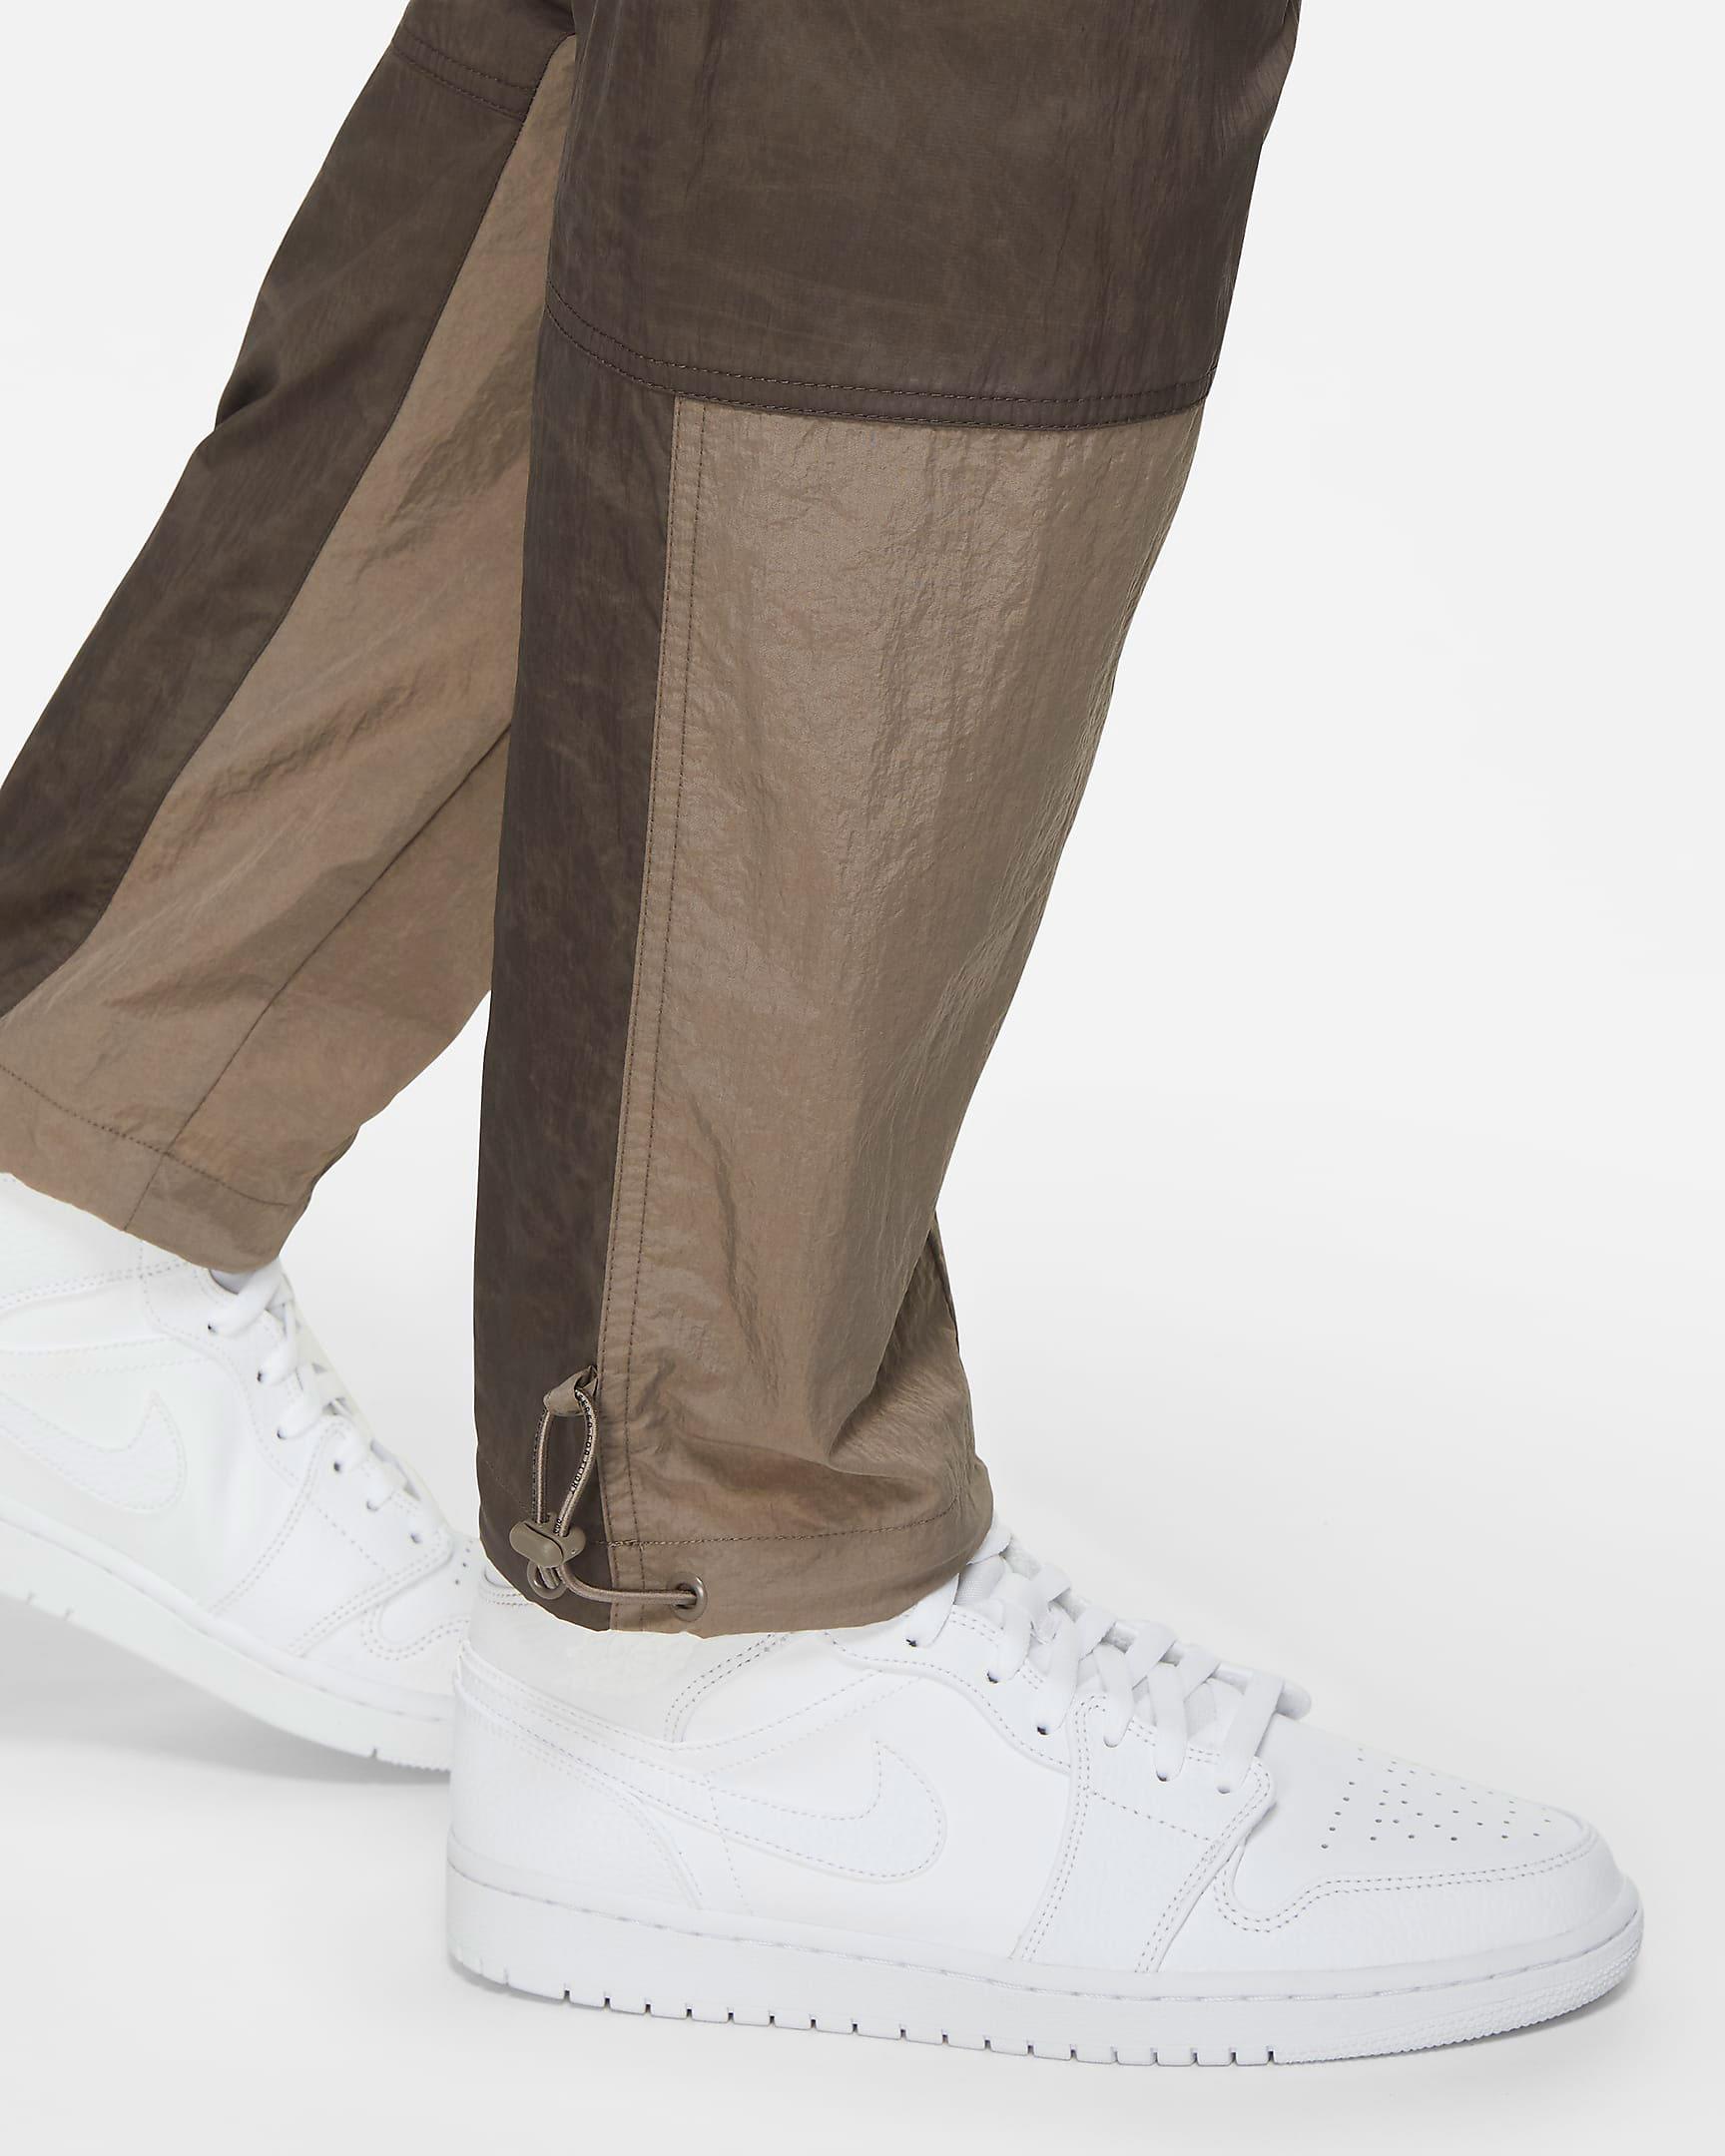 jordan-1-dark-mocha-cargo-pants-match-6